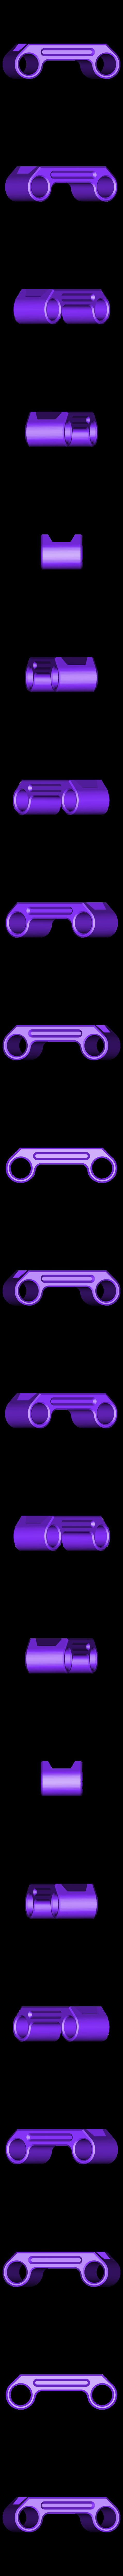 Follow_Focus_Rods_Holder.STL Download STL file 3D_Print_Follow_Focus_V2.0 • 3D printable template, SWANGLEI